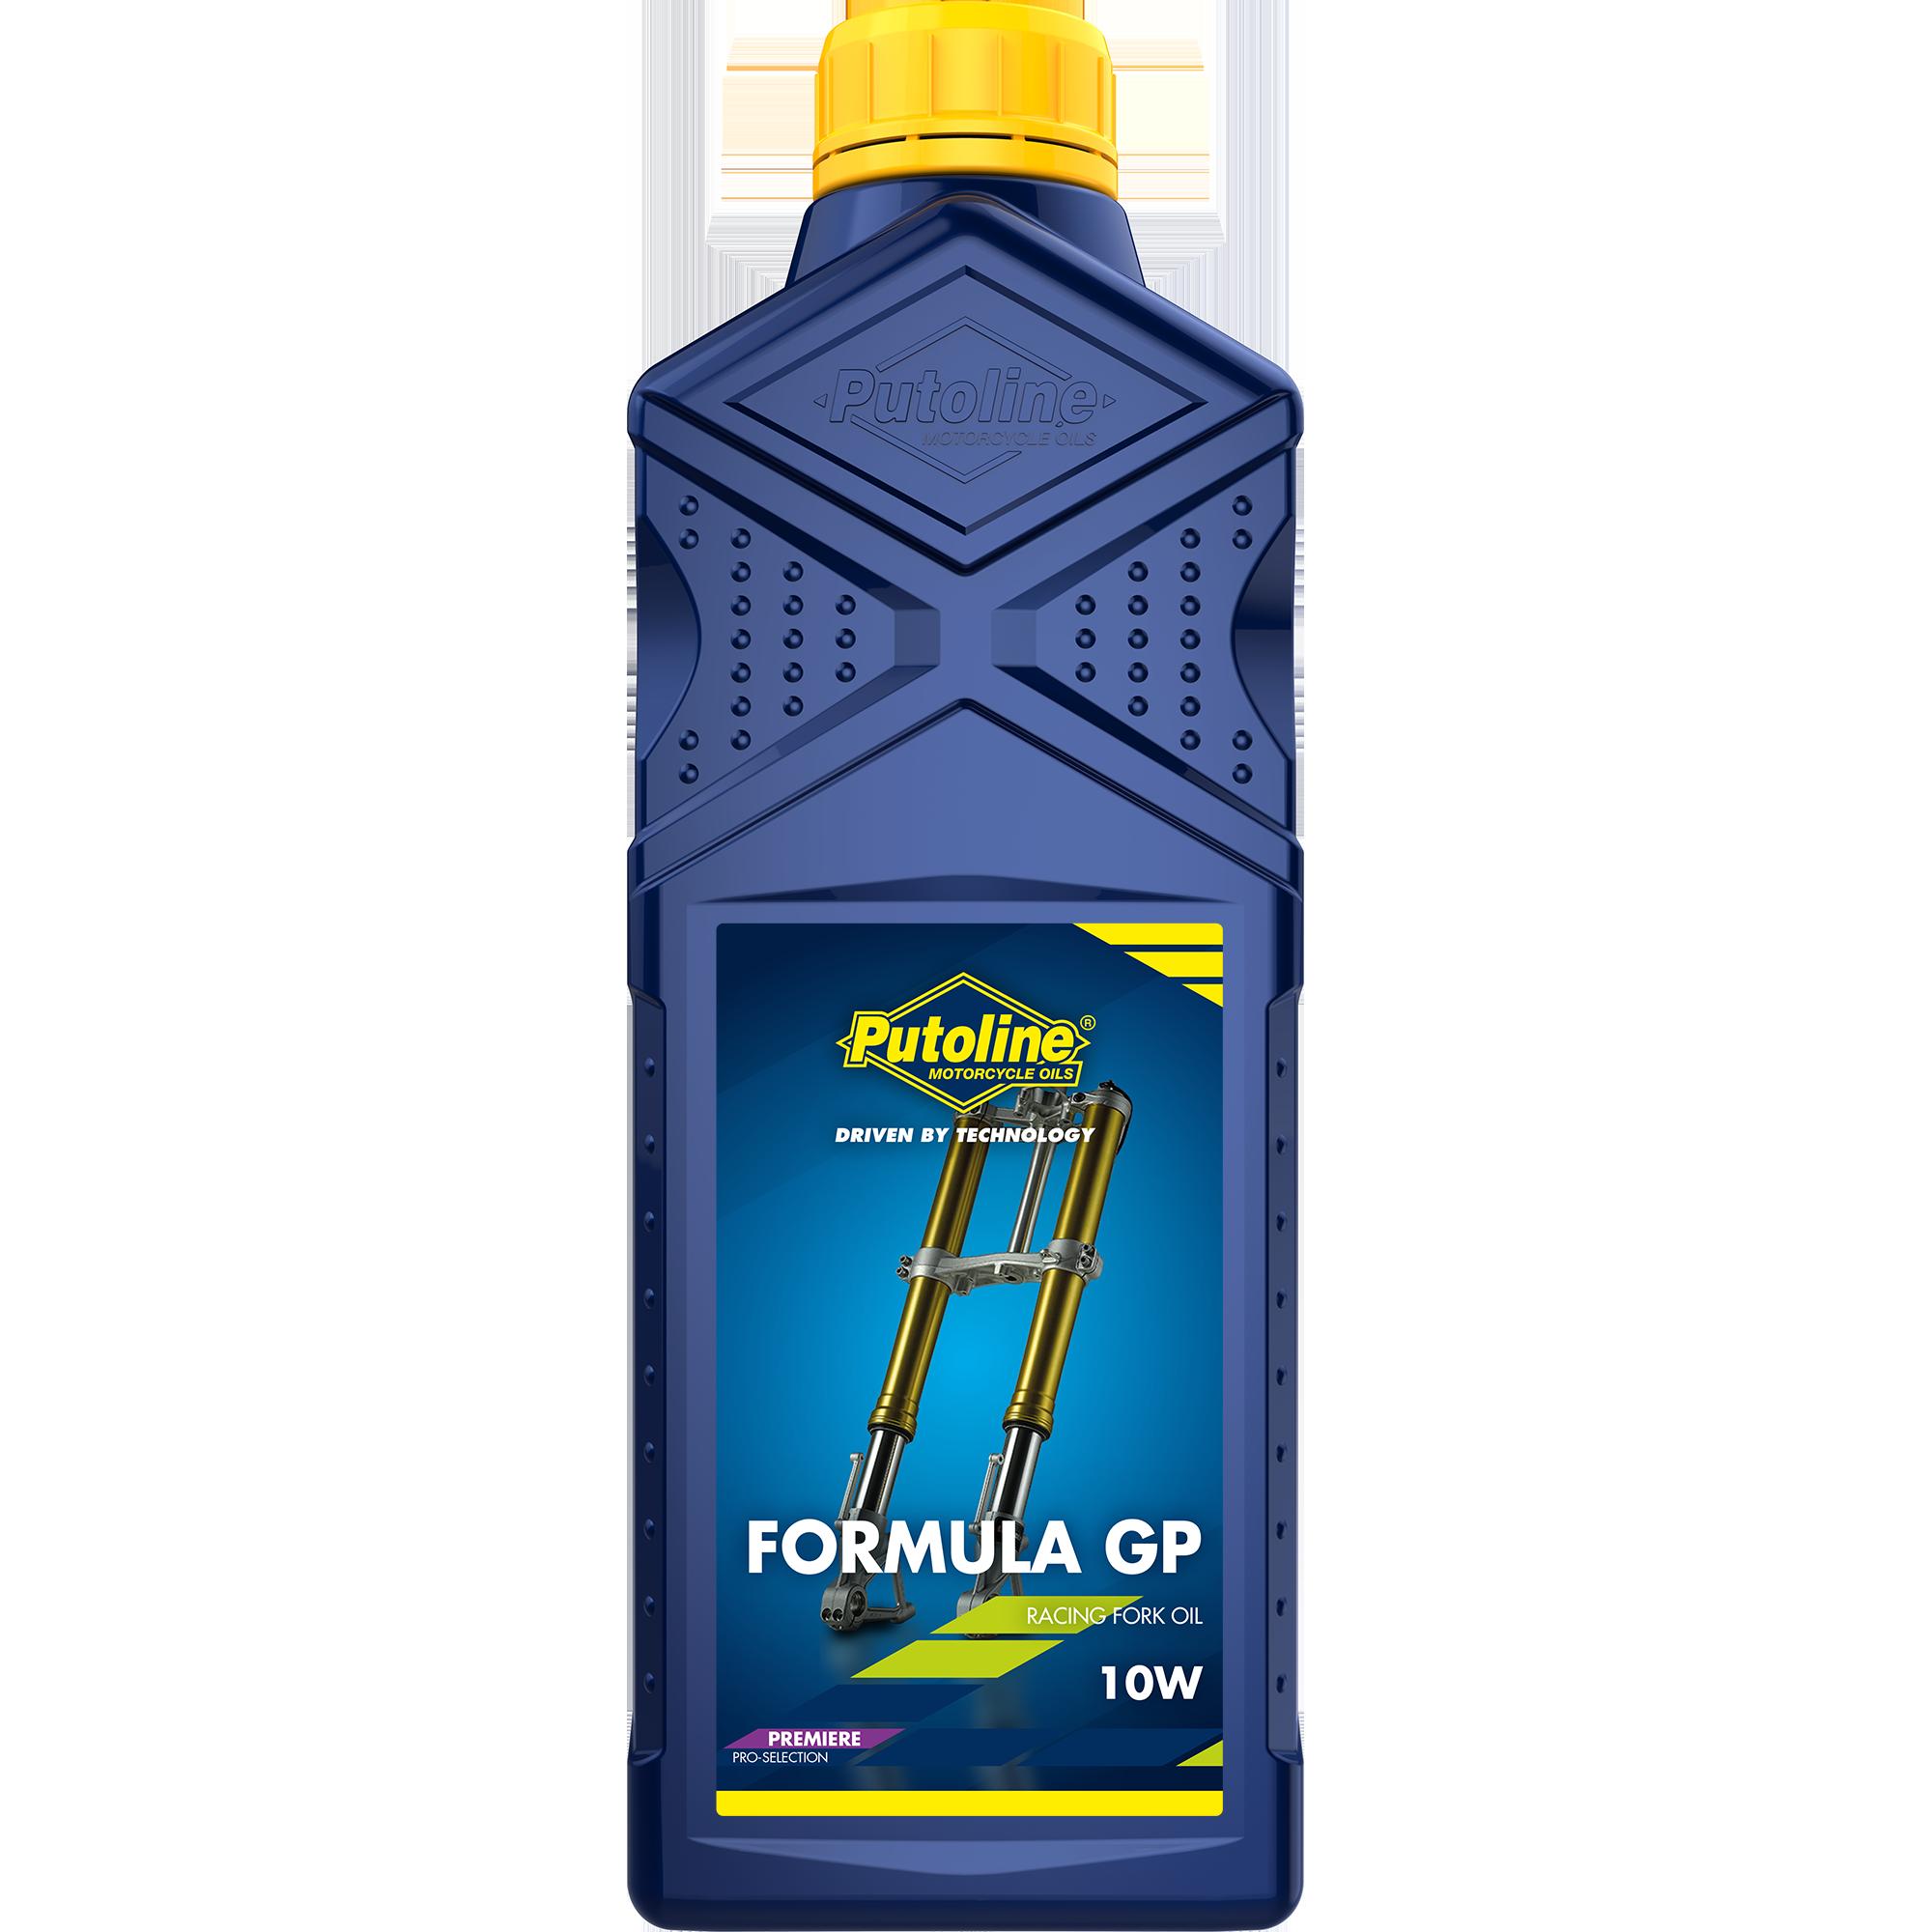 Putoline Gabelöl Formula GP 10W 1L